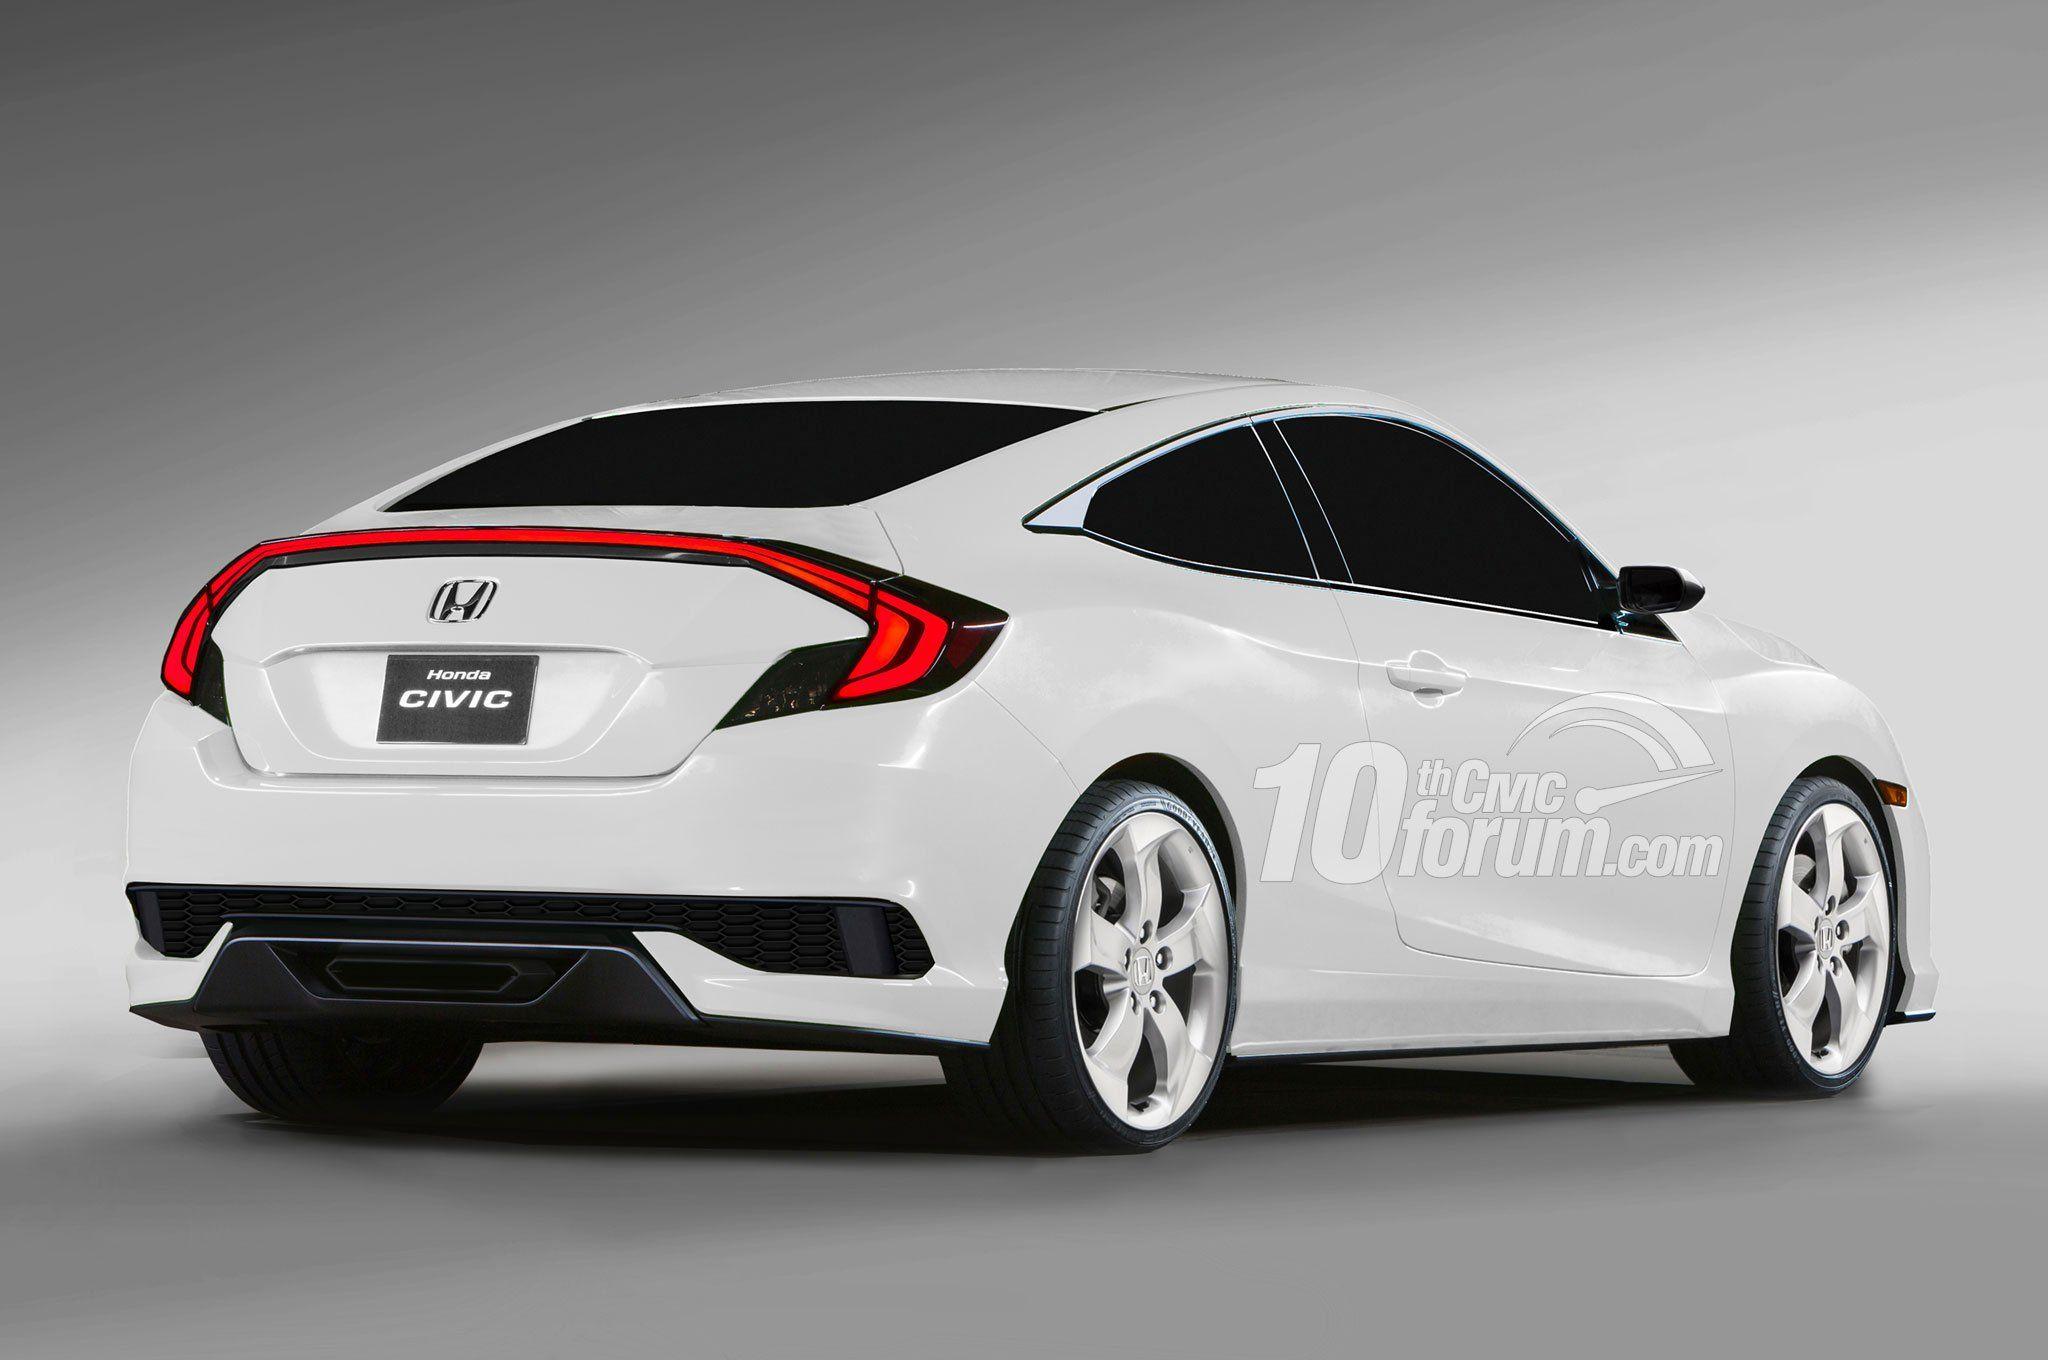 2016 Honda Civic Coupe, Hatchback and Sedan Rendered